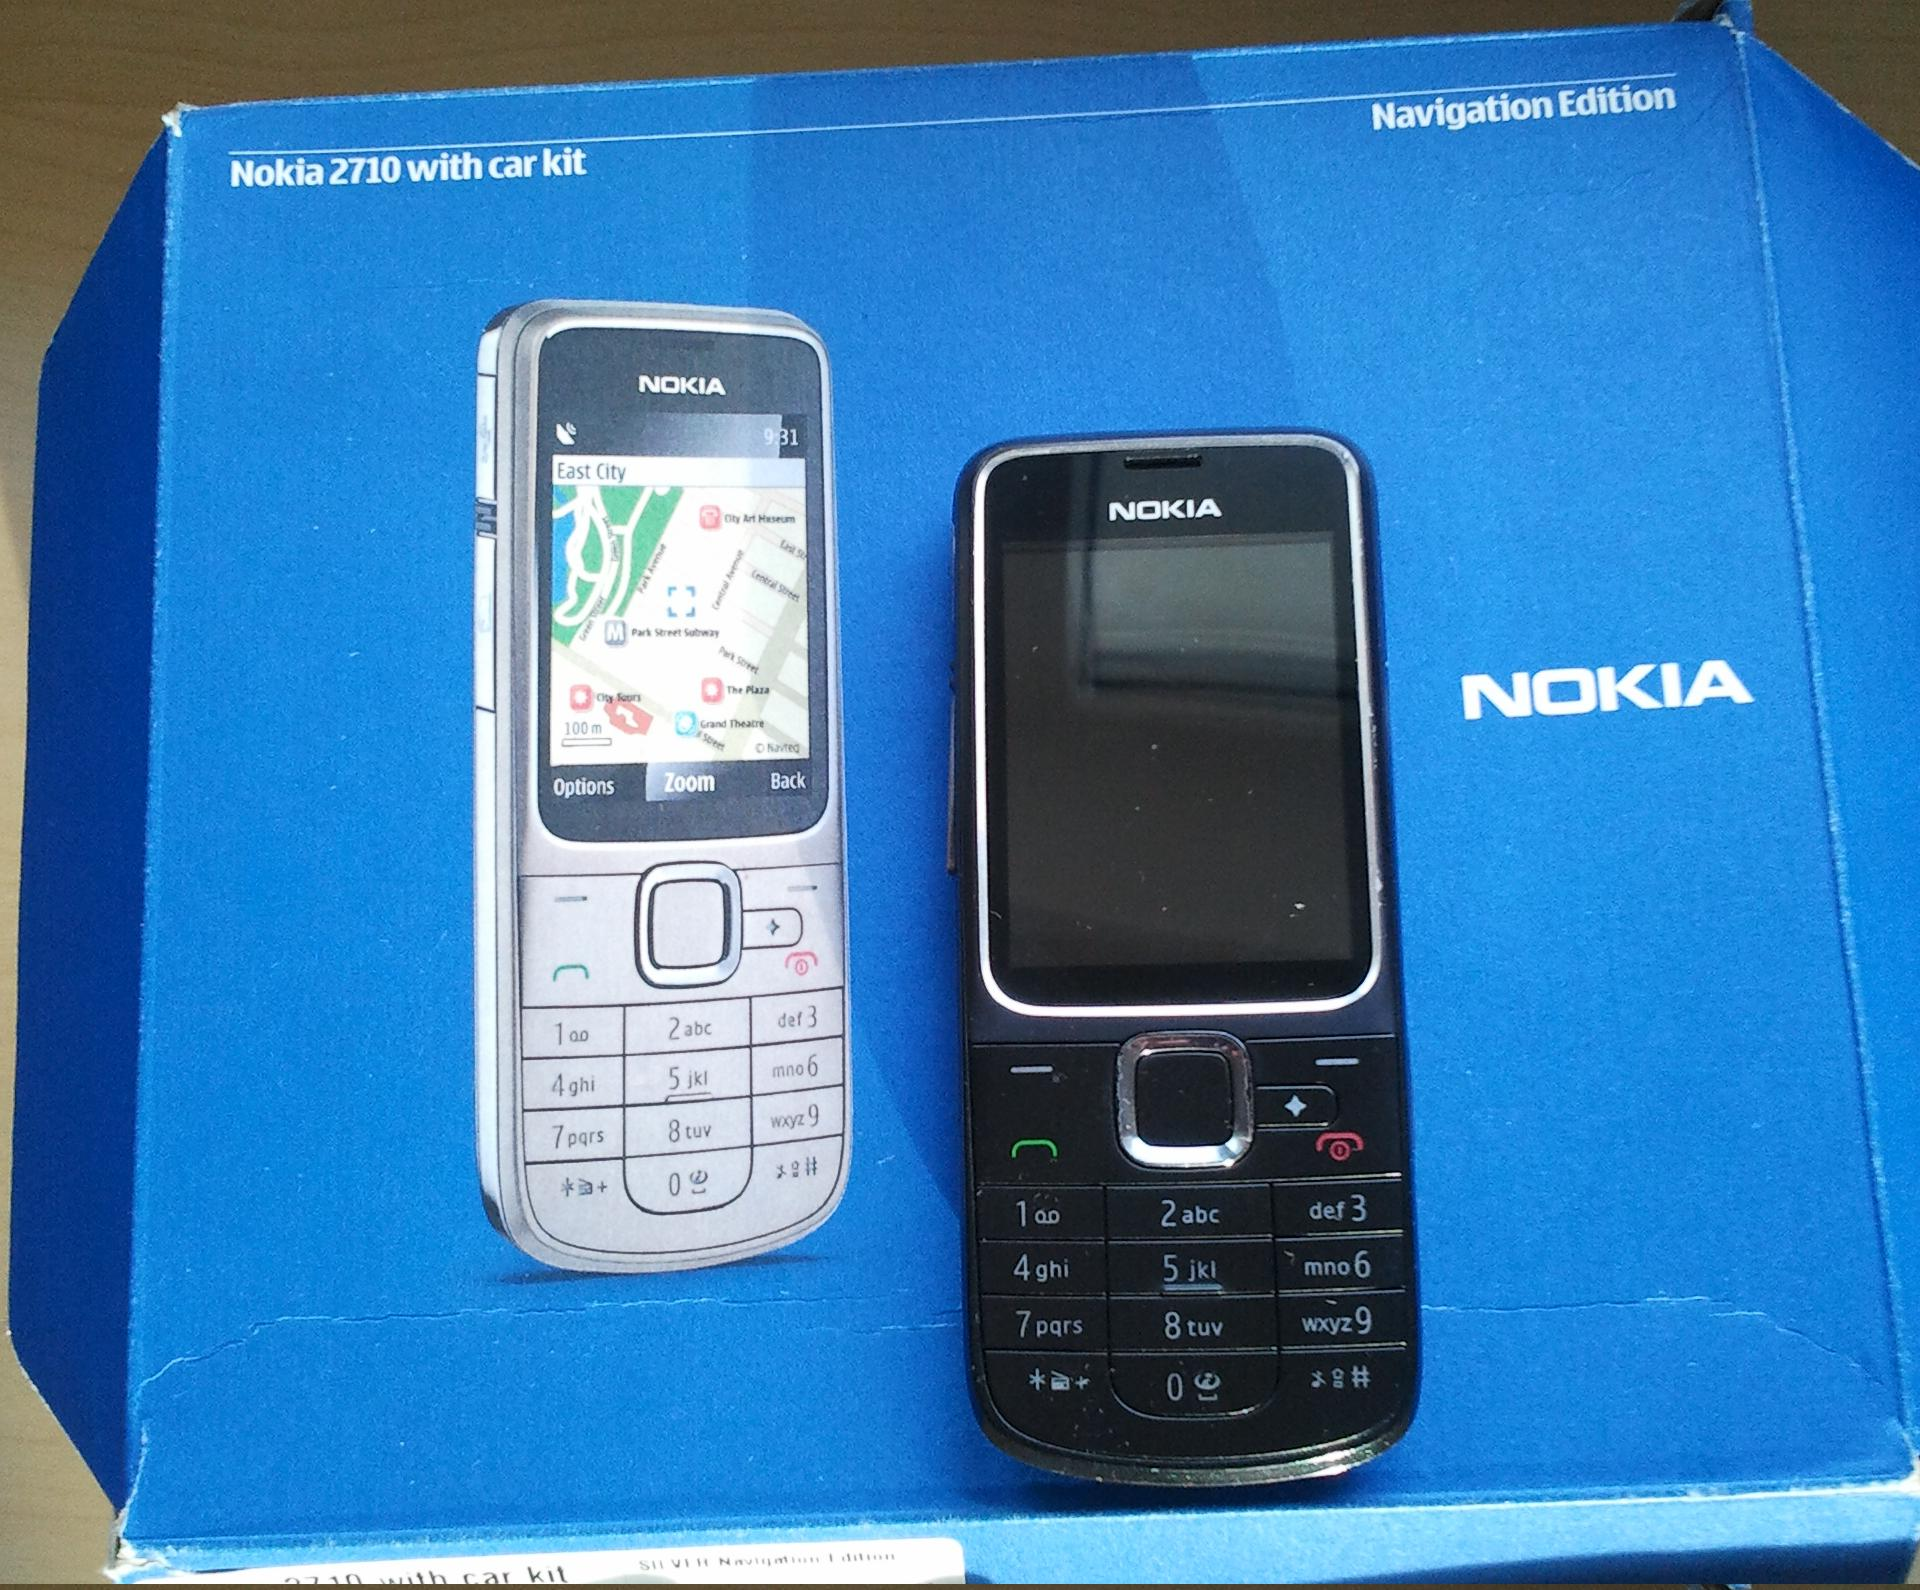 File:Nokia 2710.jpg